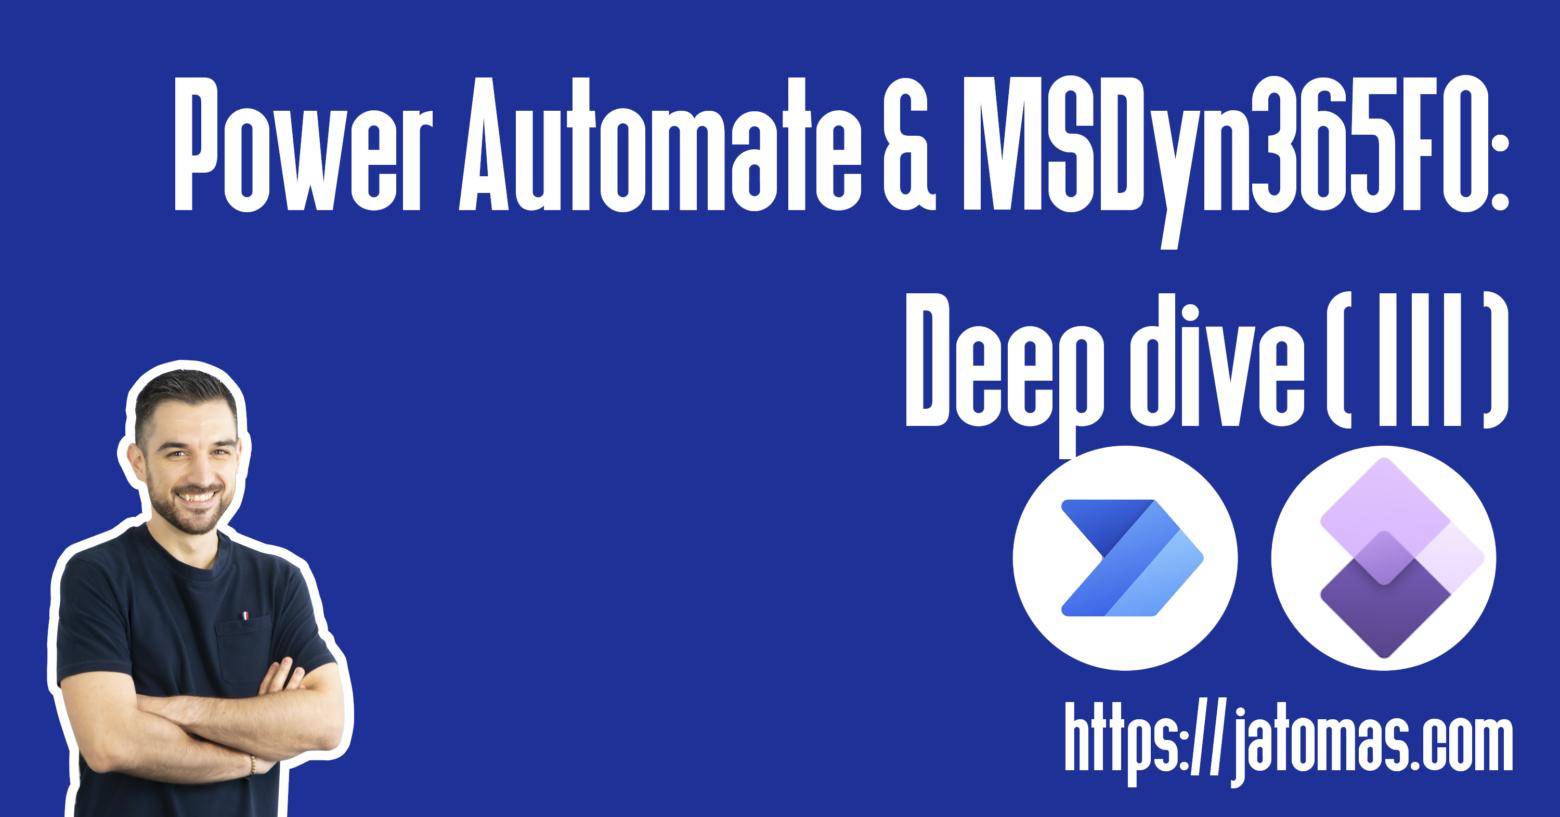 Power Automate & MSDyn365FO: Deep dive (III)